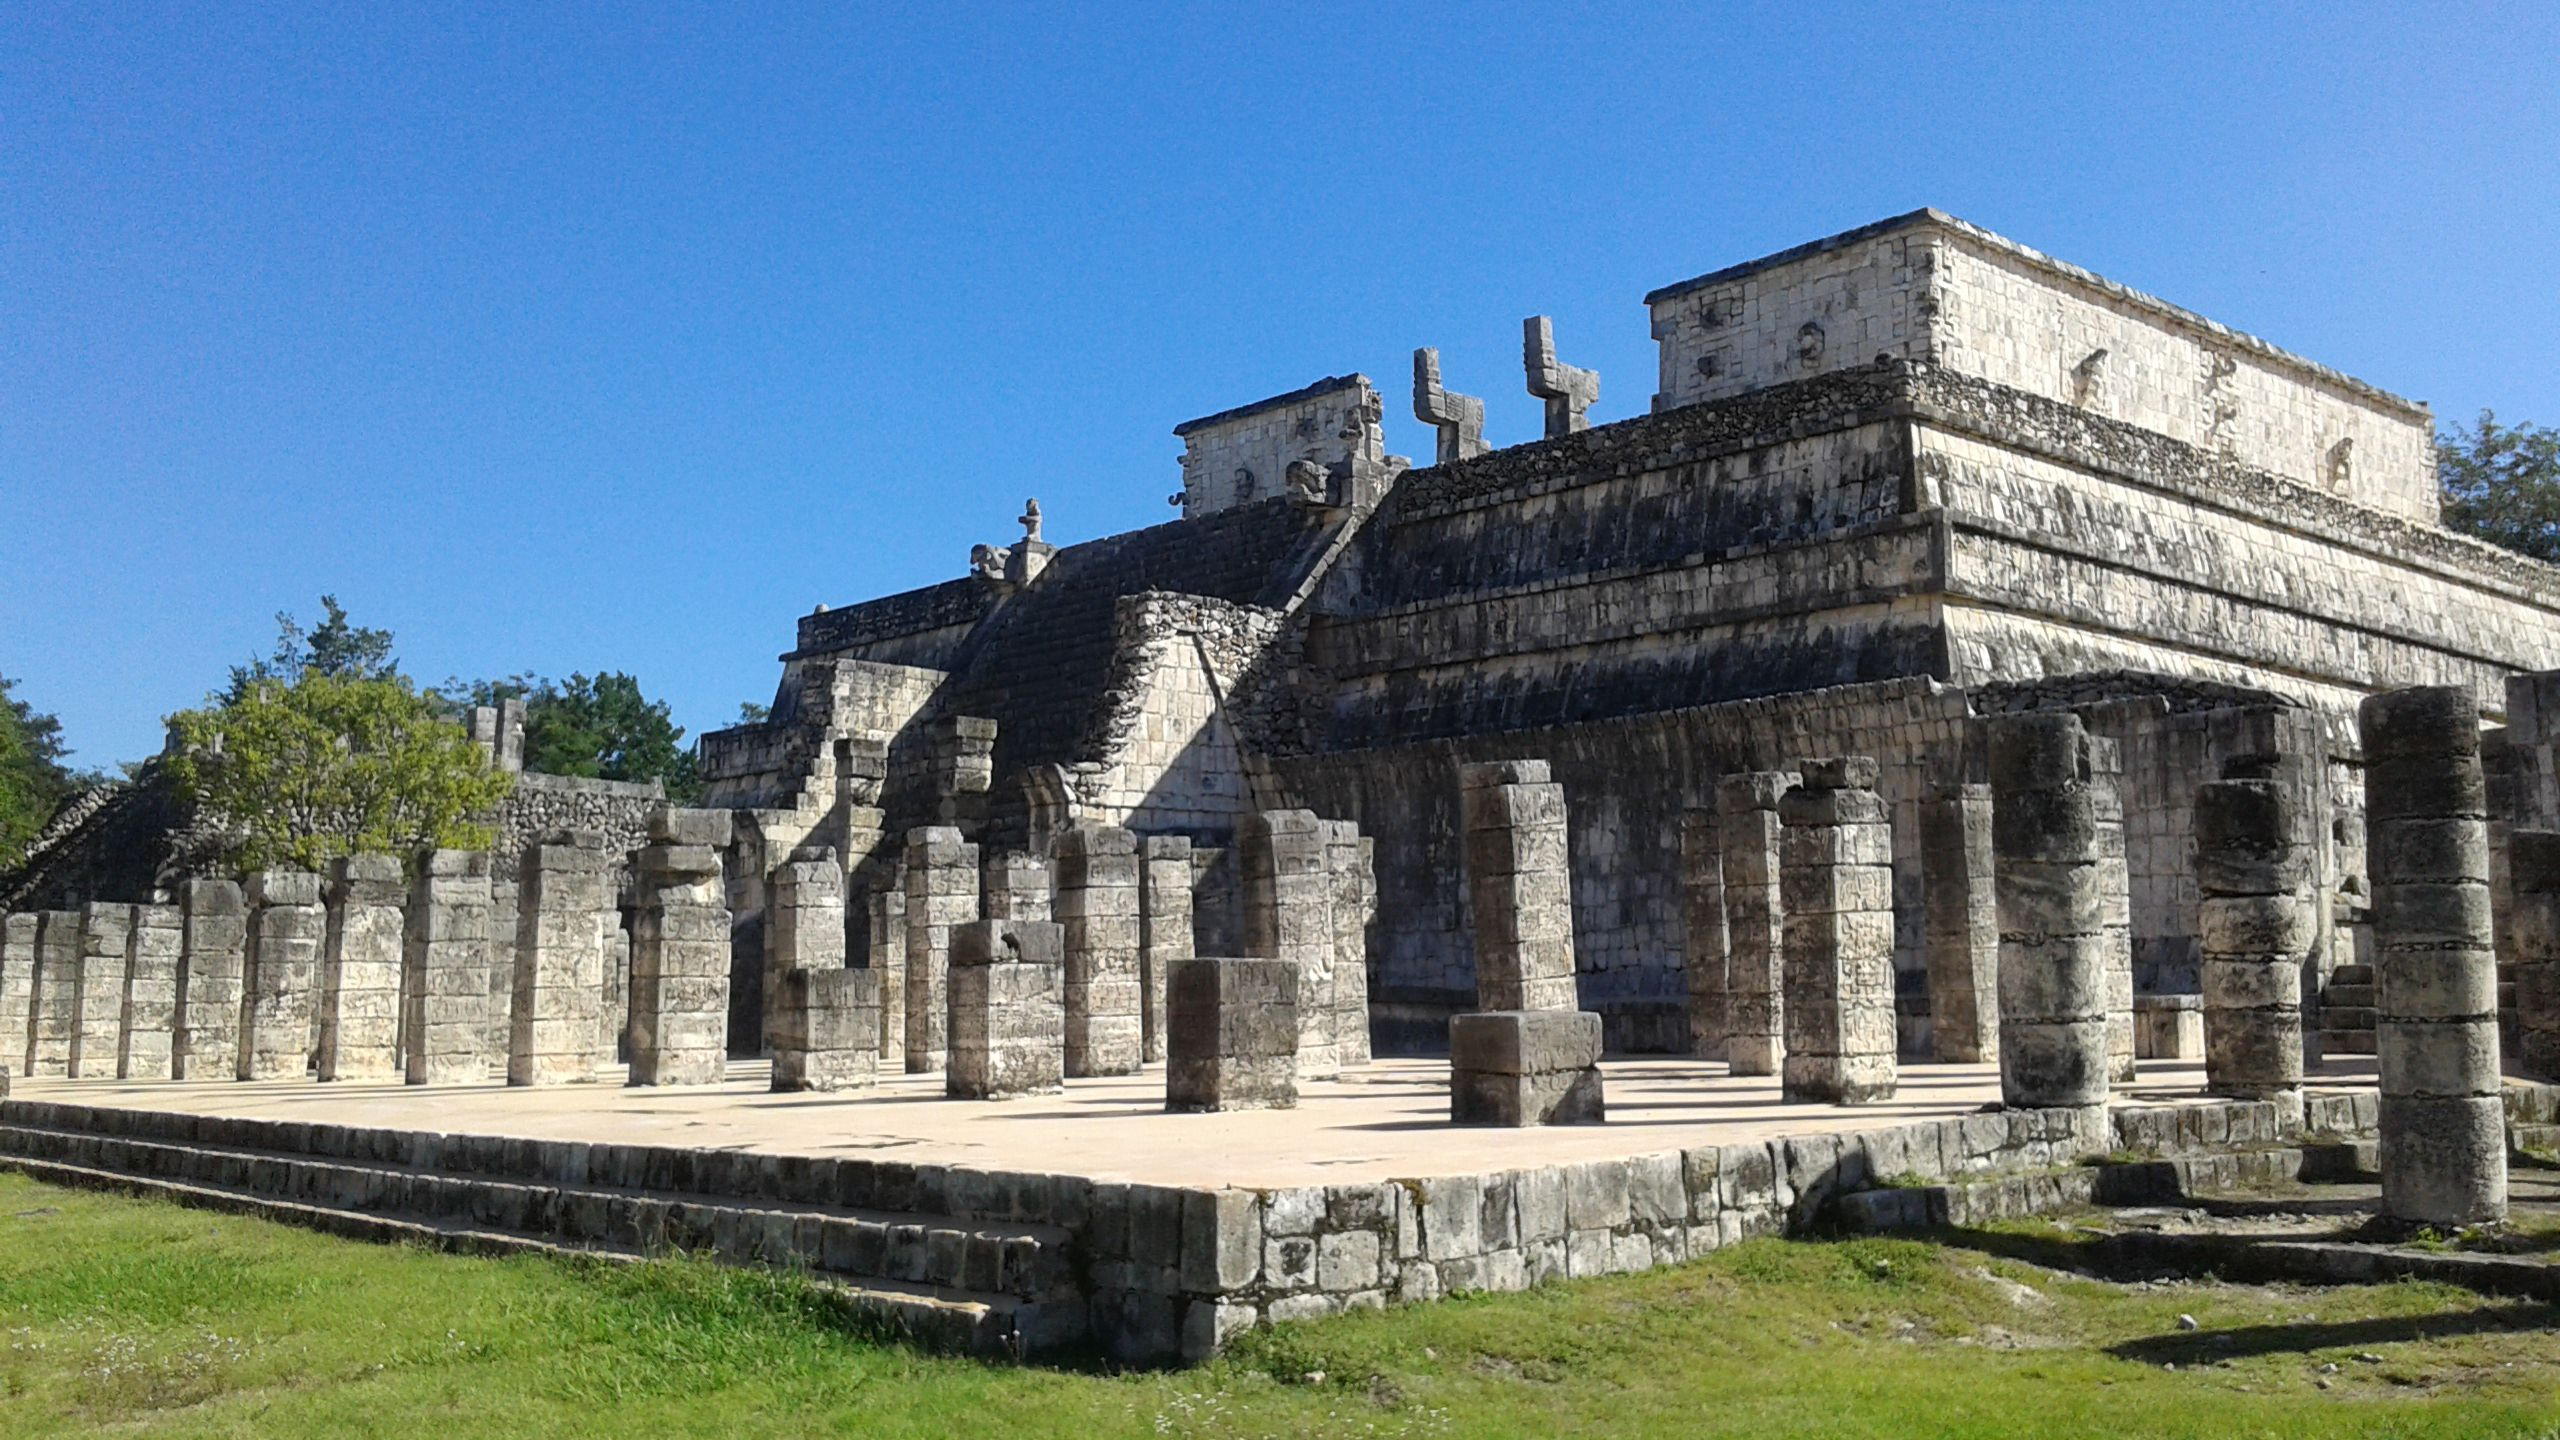 A Mexican Mayan ruin